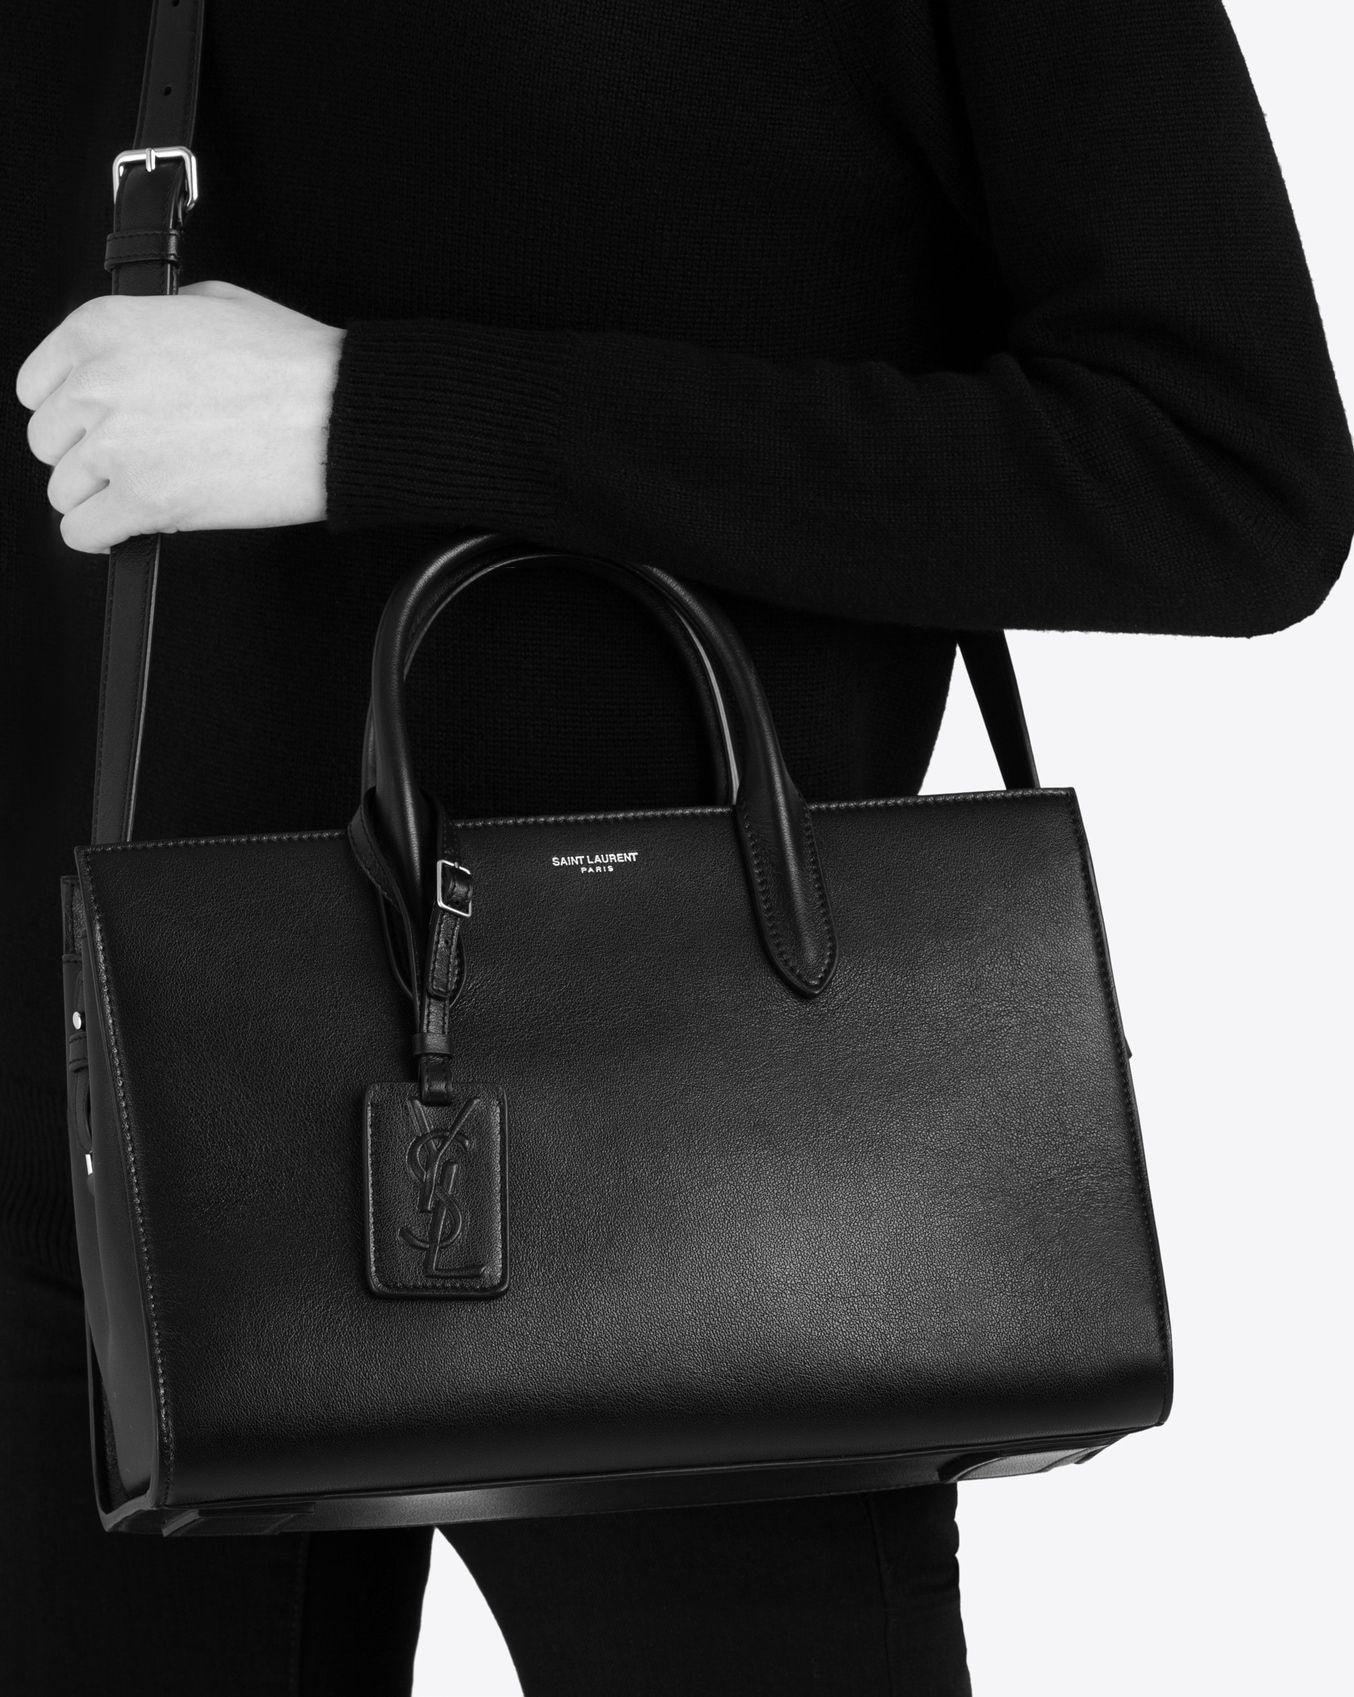 55d82fae8 Saint Laurent Medium JANE Tote Bag In Black Leather | YSL.com ...